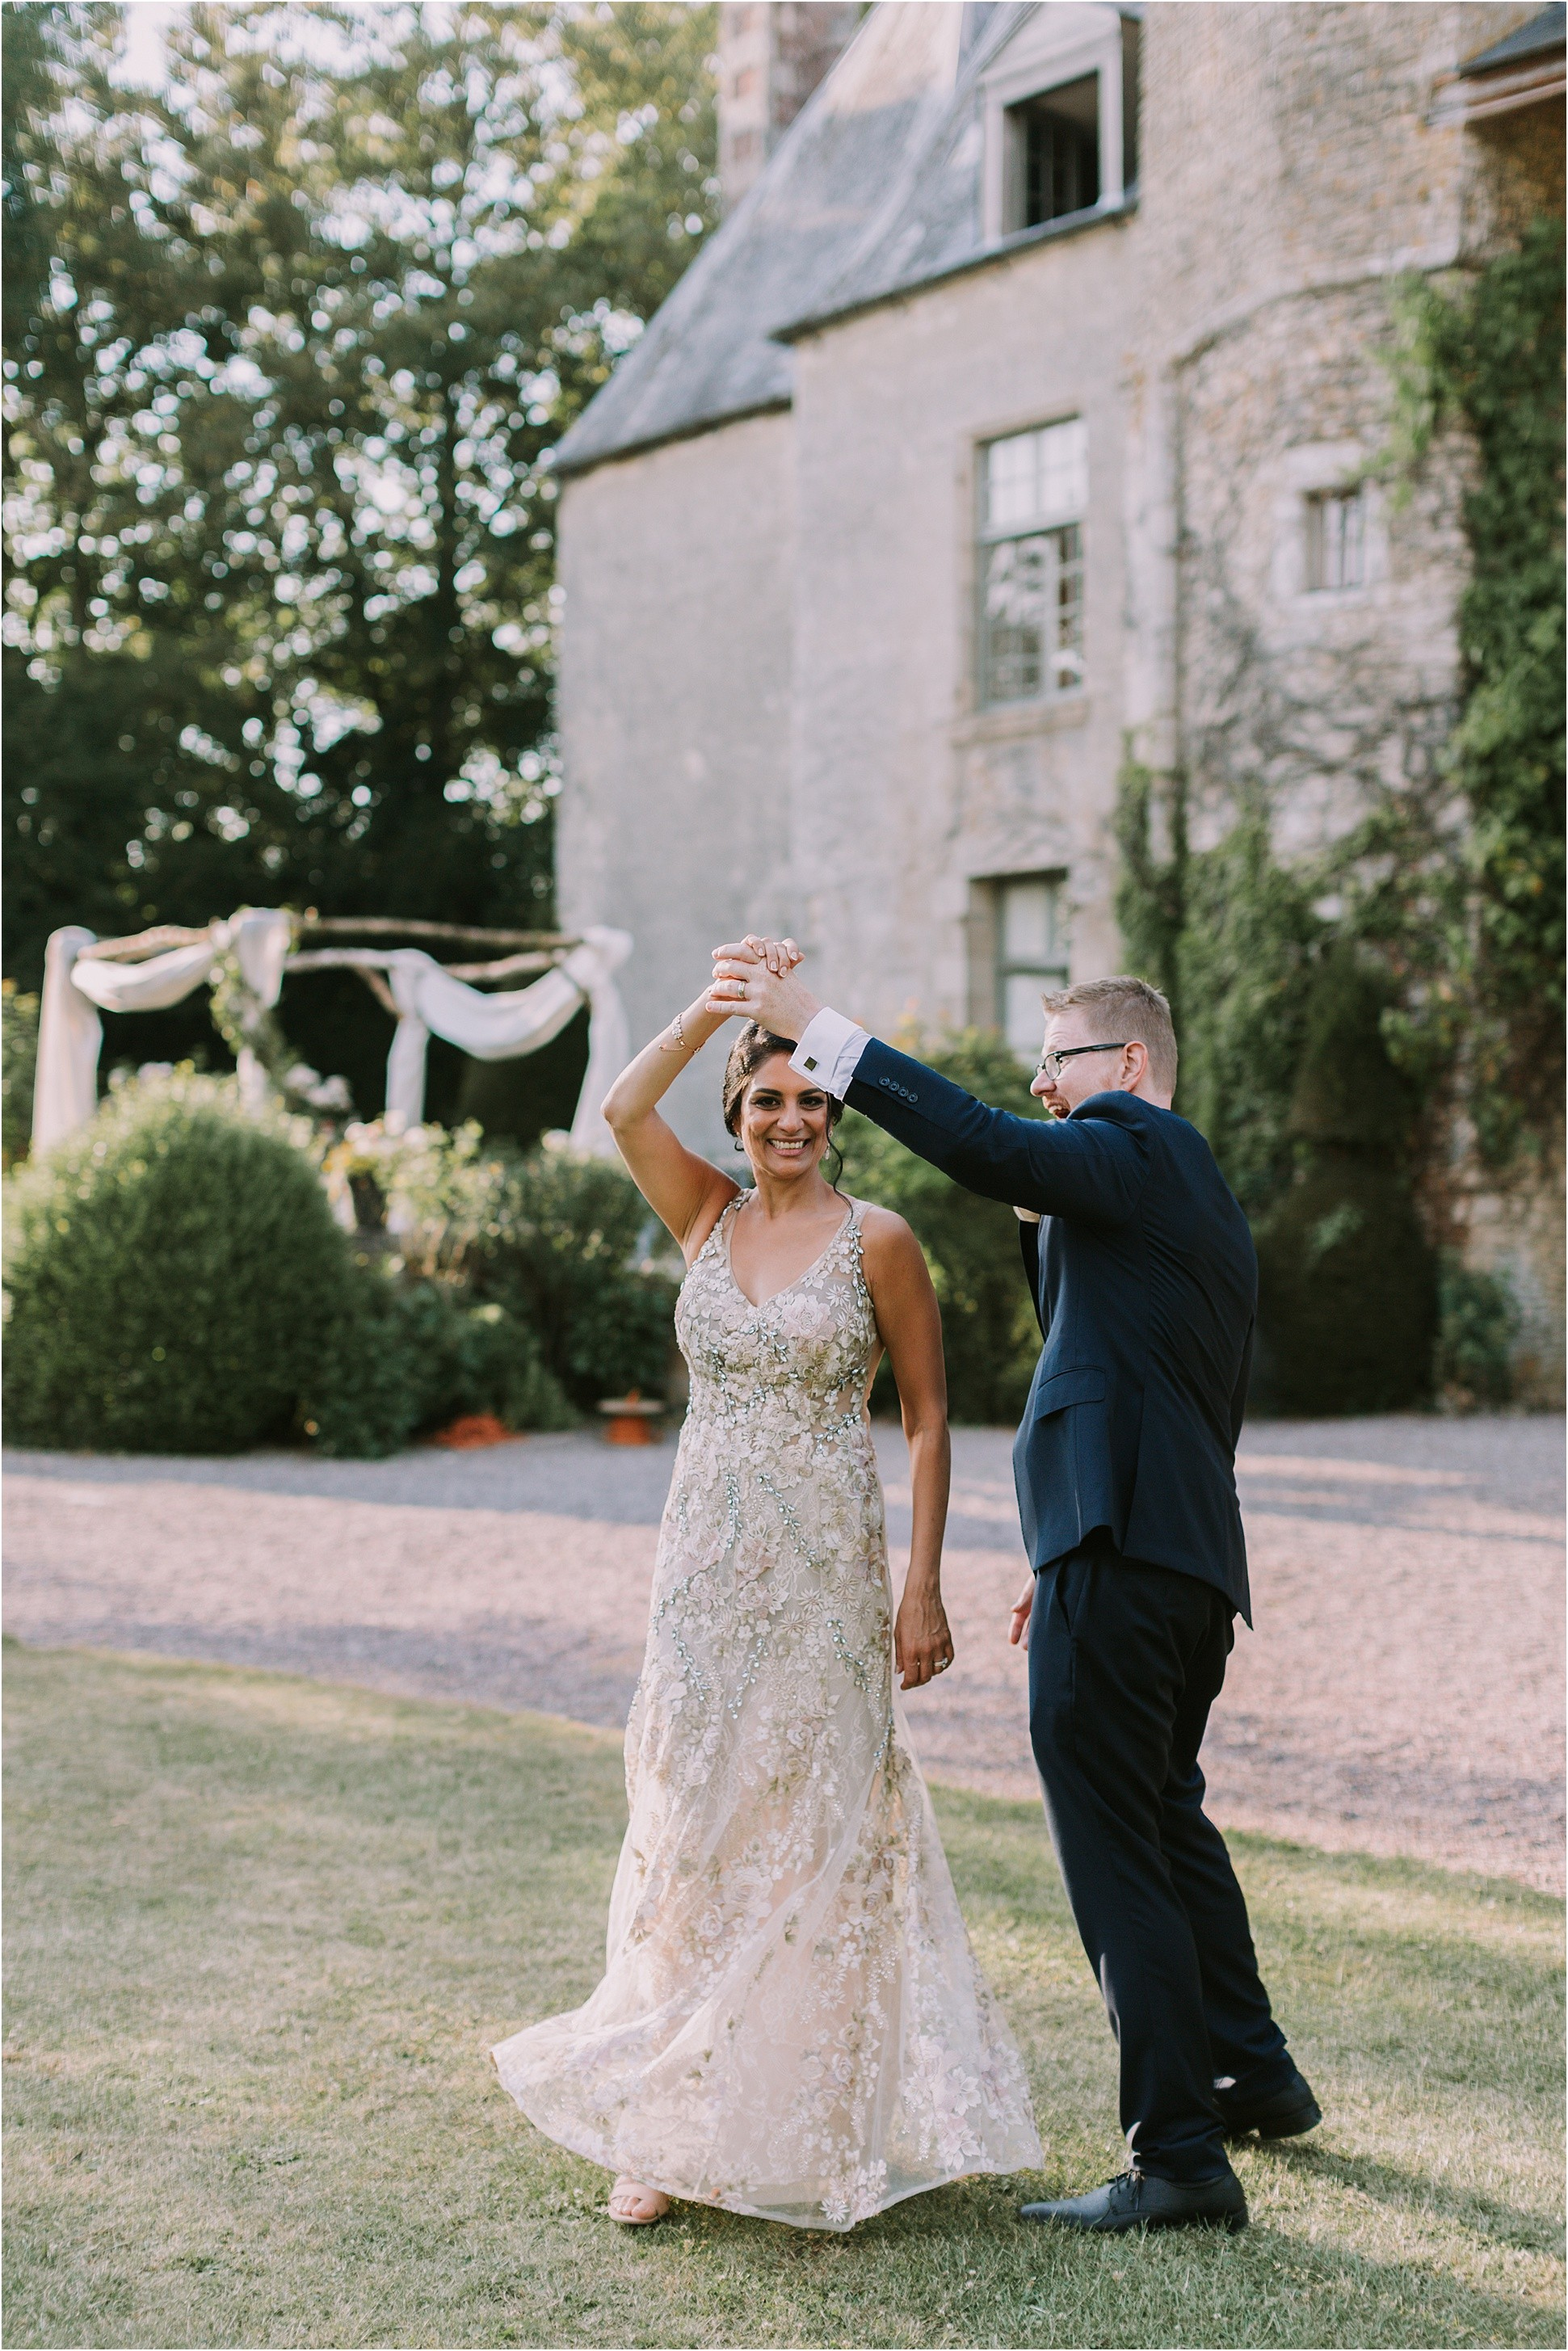 Kateryna-photos-photographe-mariage-chateau-st-paterne-mayenne-normandie_0170.jpg